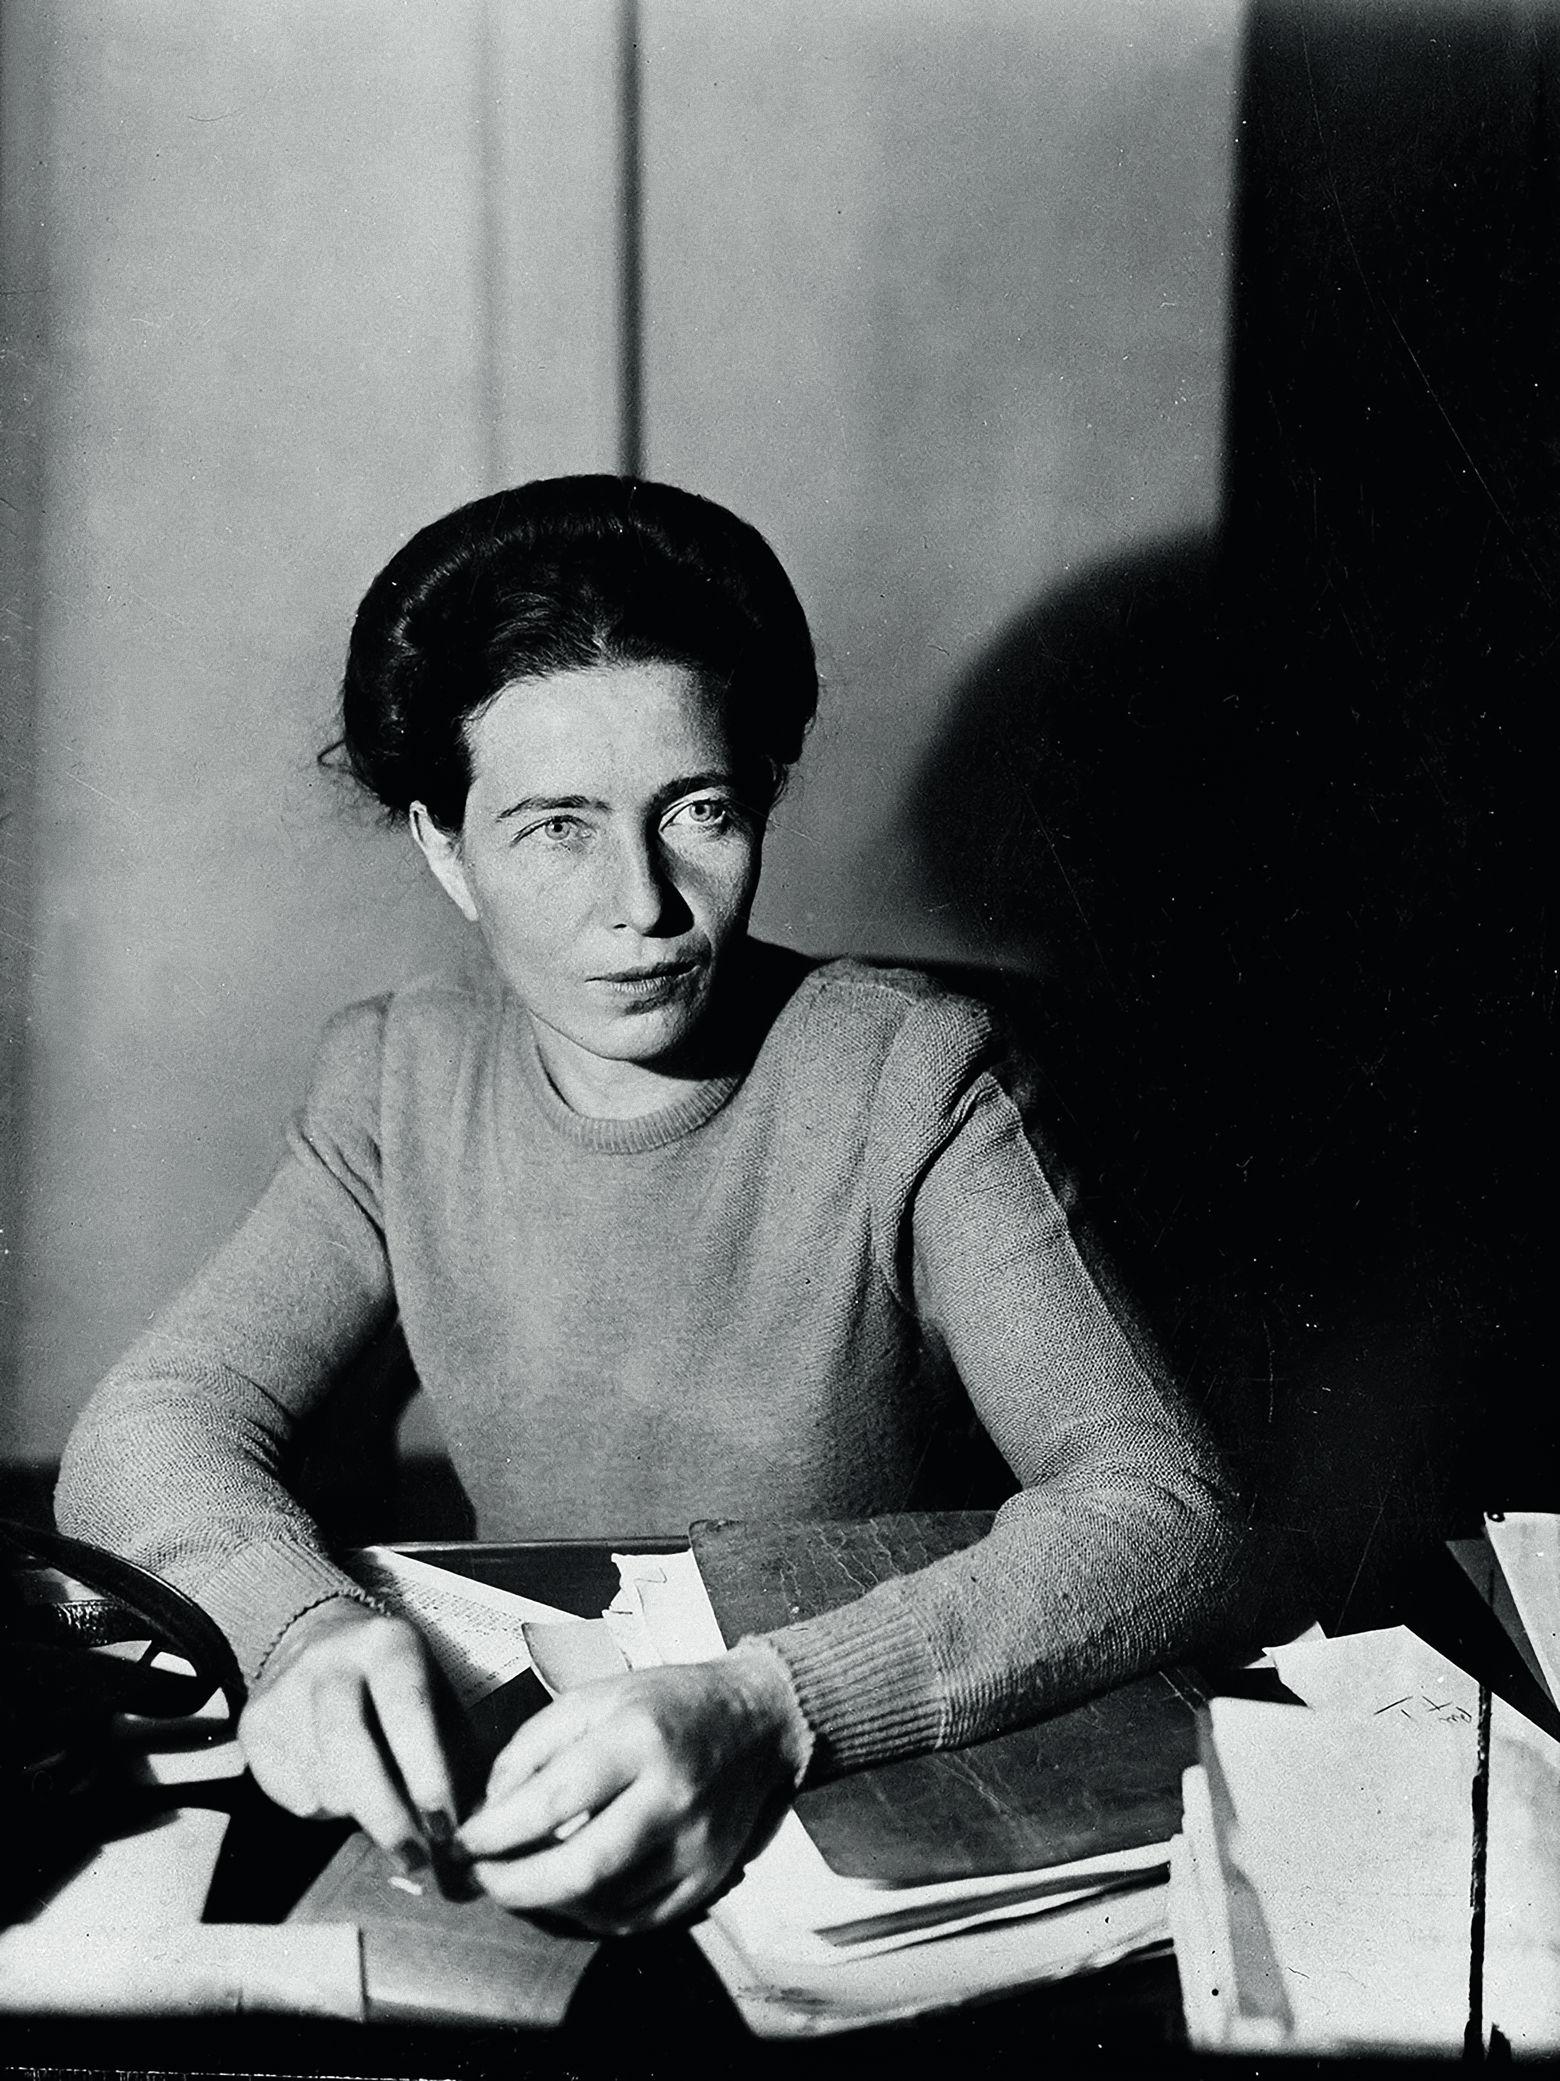 Писательница, философ, идеолог феминизма Симона де Бовуар